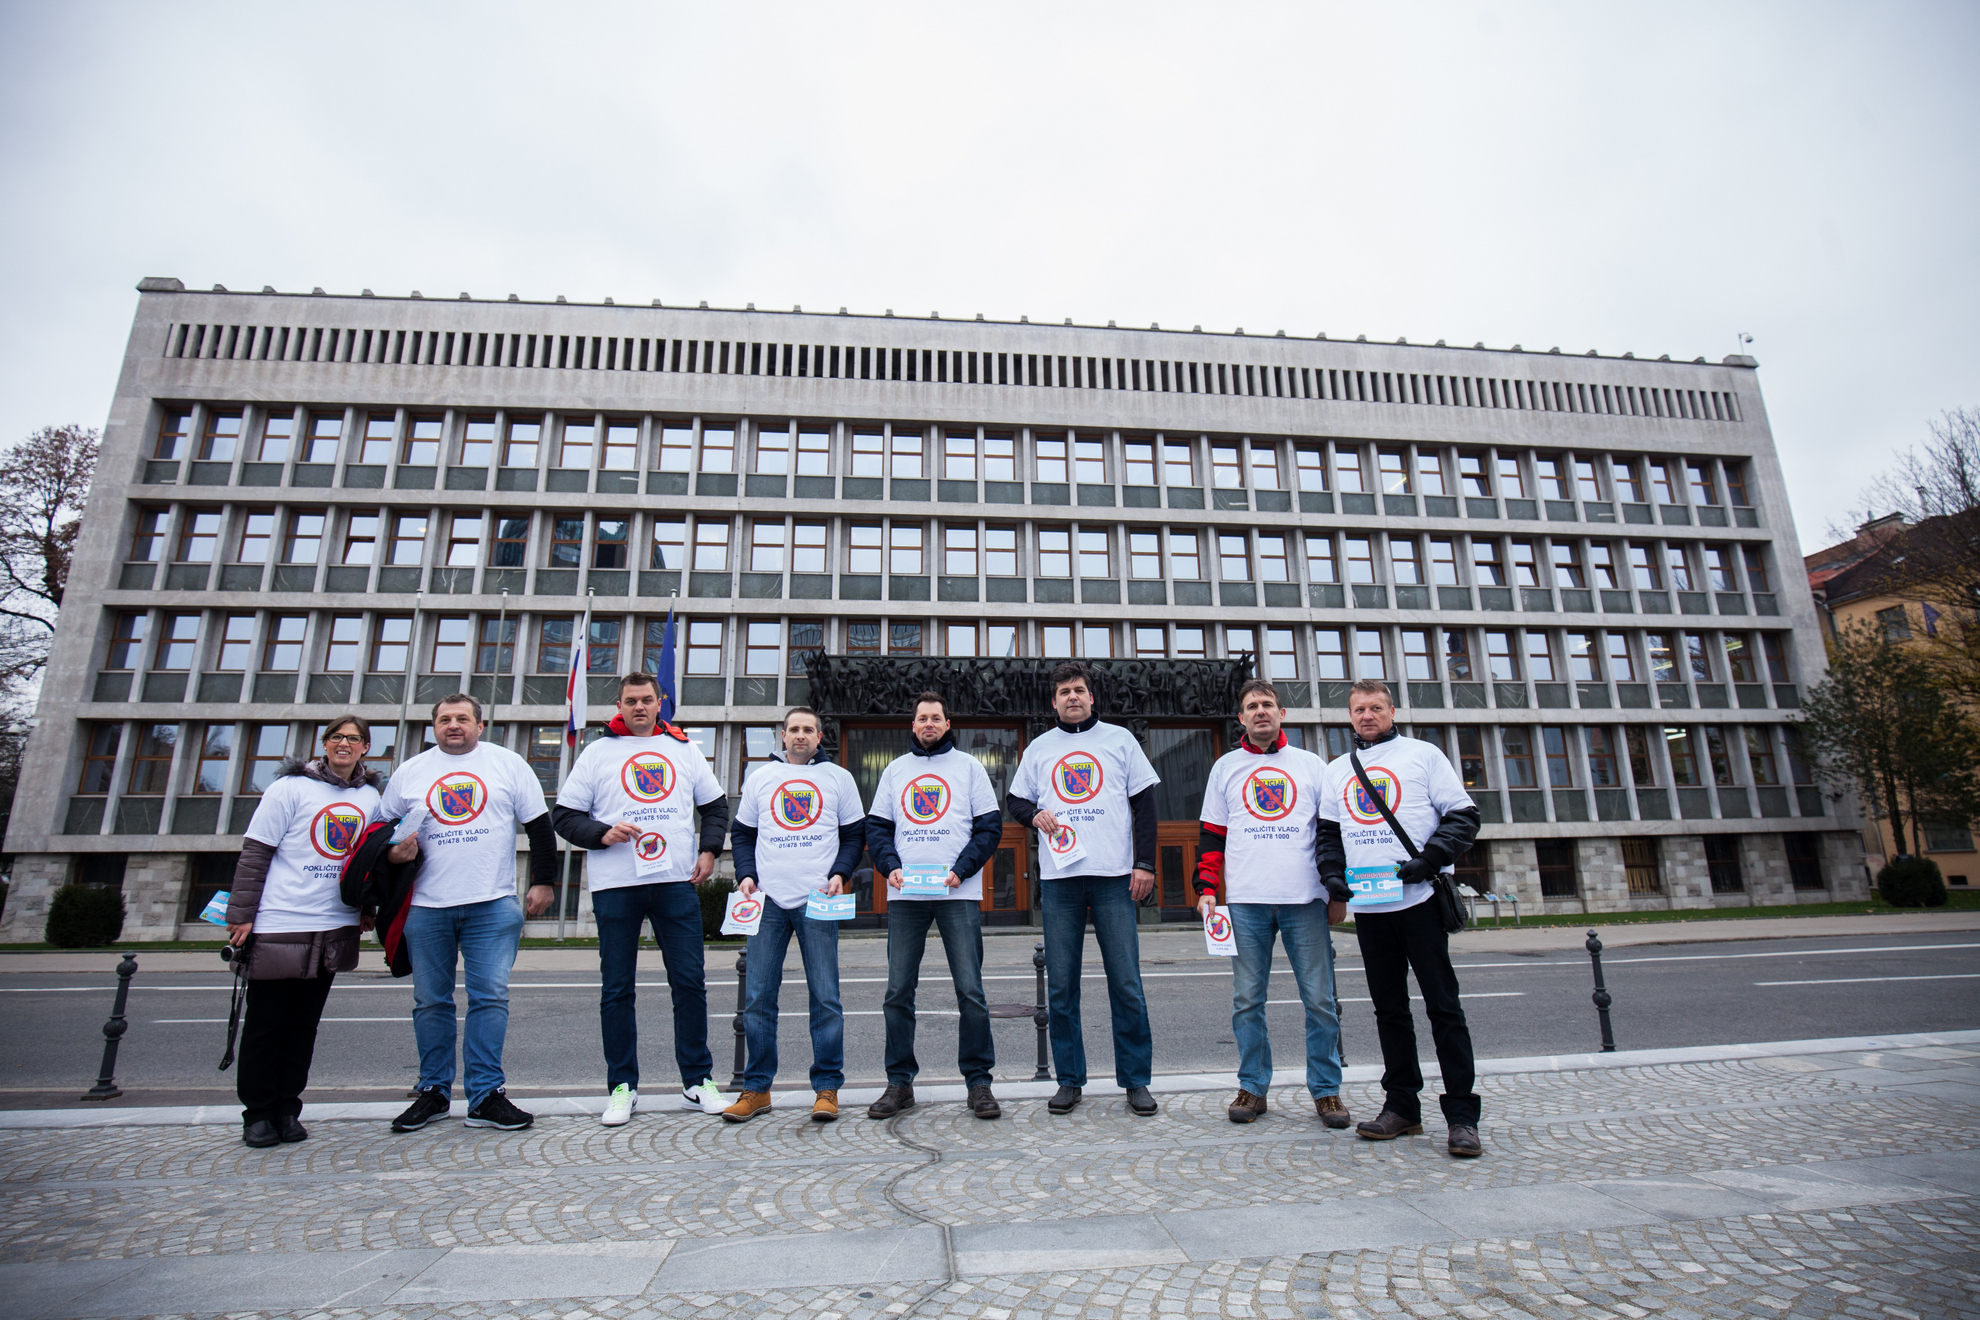 Ljubljana, Trg republike. Združena policijska sindikata pred Državnim zborom.